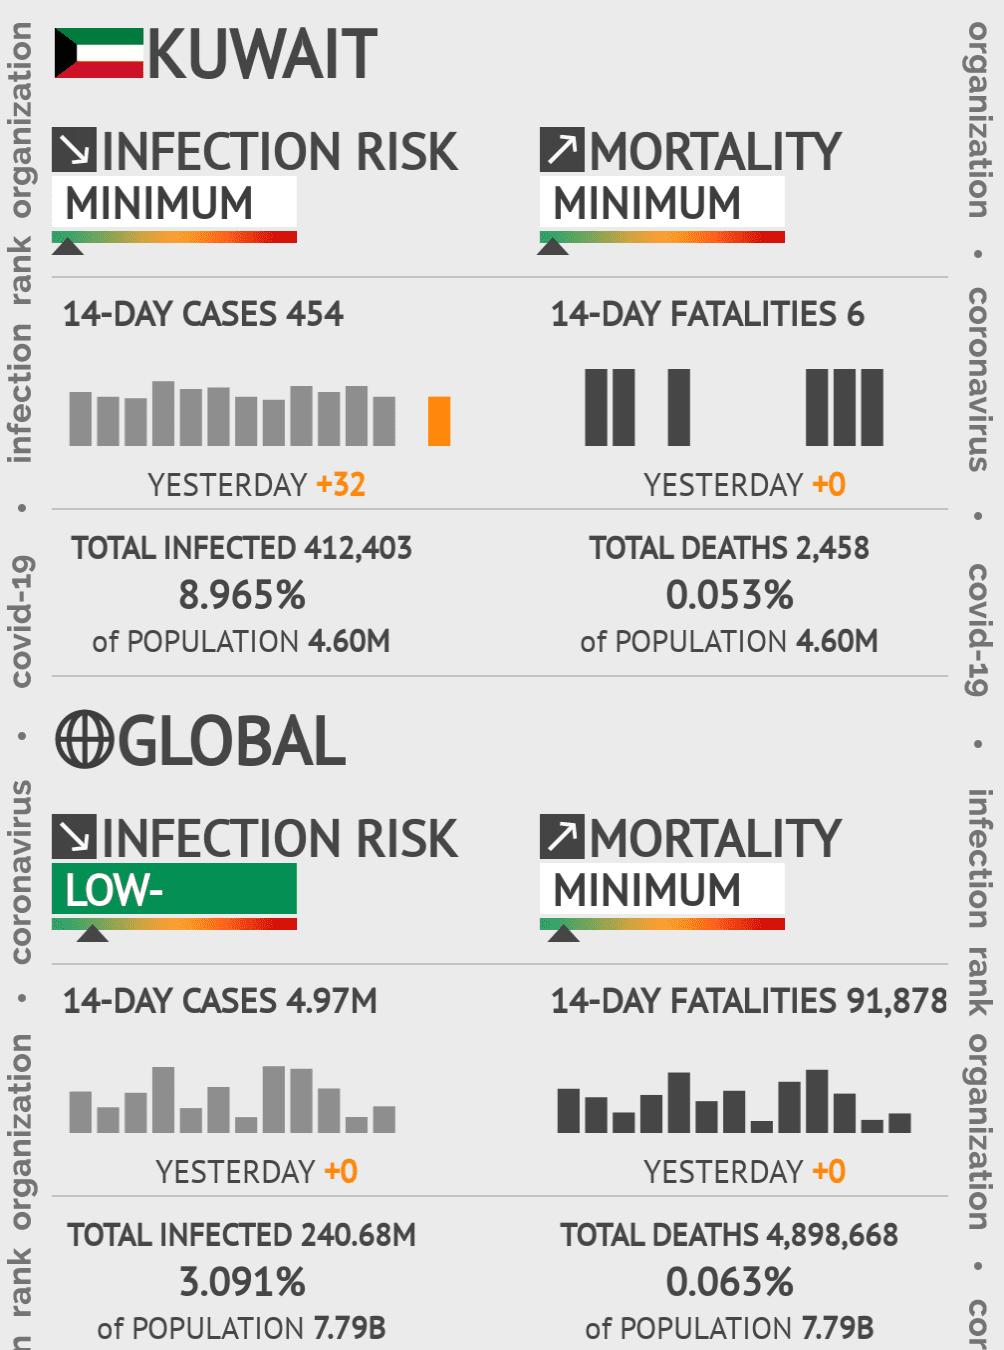 Kuwait Coronavirus Covid-19 Risk of Infection on January 21, 2021